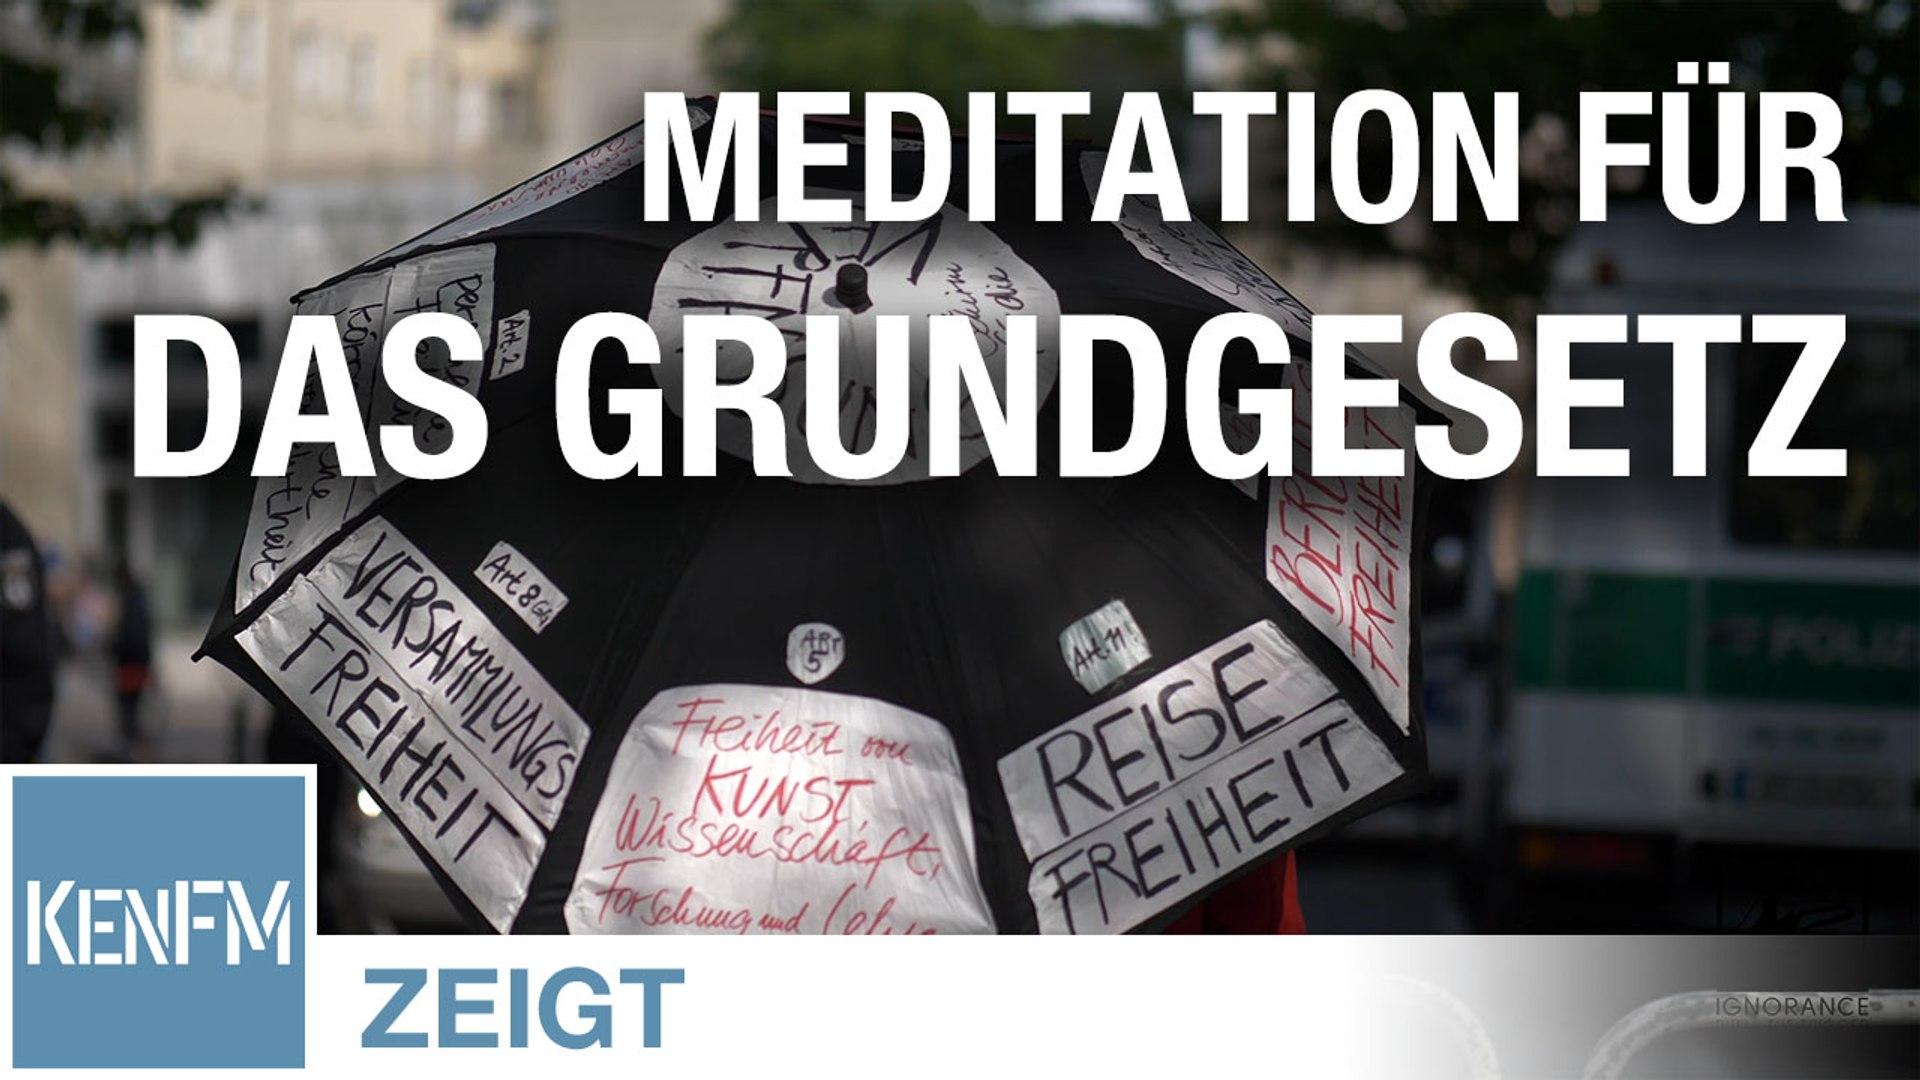 Ignorance Meditation am 9. Mai 2020 in Berlin